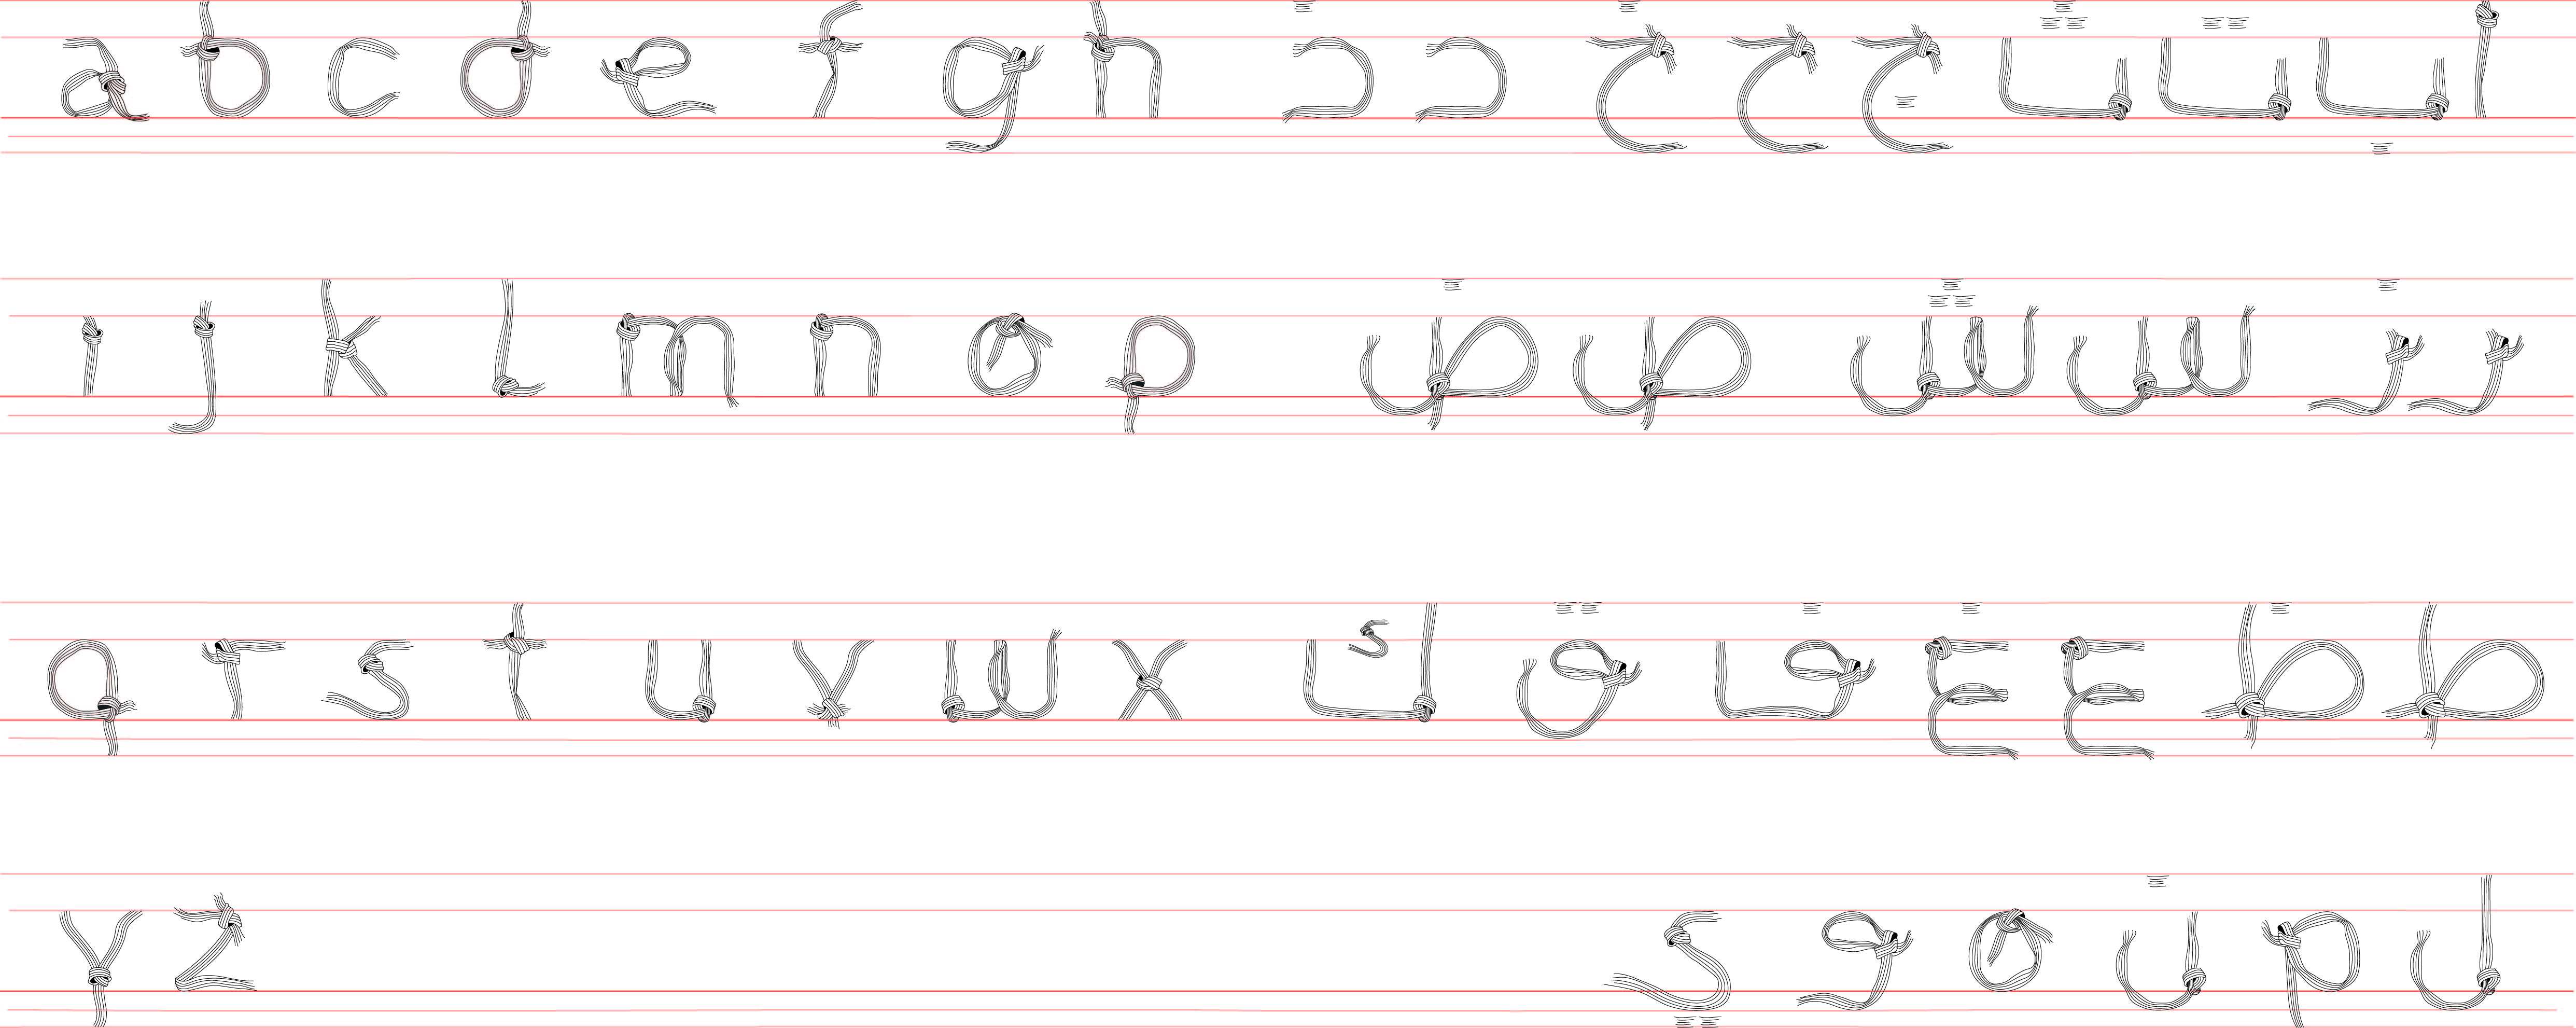 Laced- Arabe+Latin Typefaced